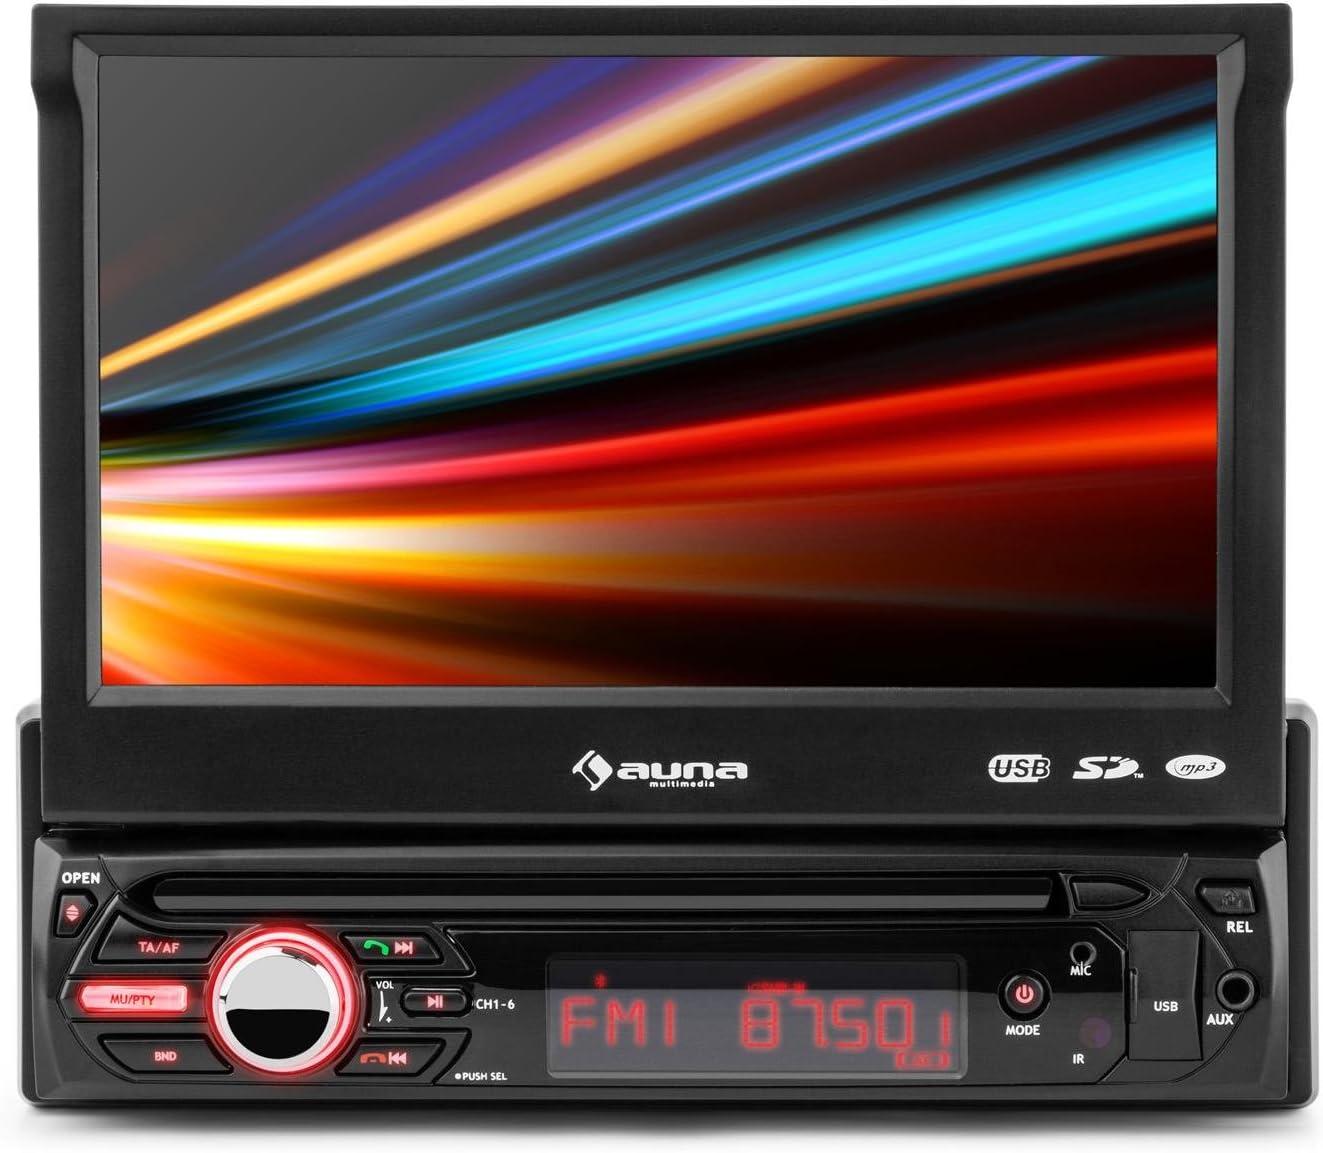 auna MVD-310 - Autorradio, Radio de Coche, Pantalla táctil 17,8 cm, Bluetooth, Entradas USB y SD, Entrada AV, Radio FM con RDS, MP3, MP4, MPEG4, WMA, Luces LED, Mando, Extraíble, Negro